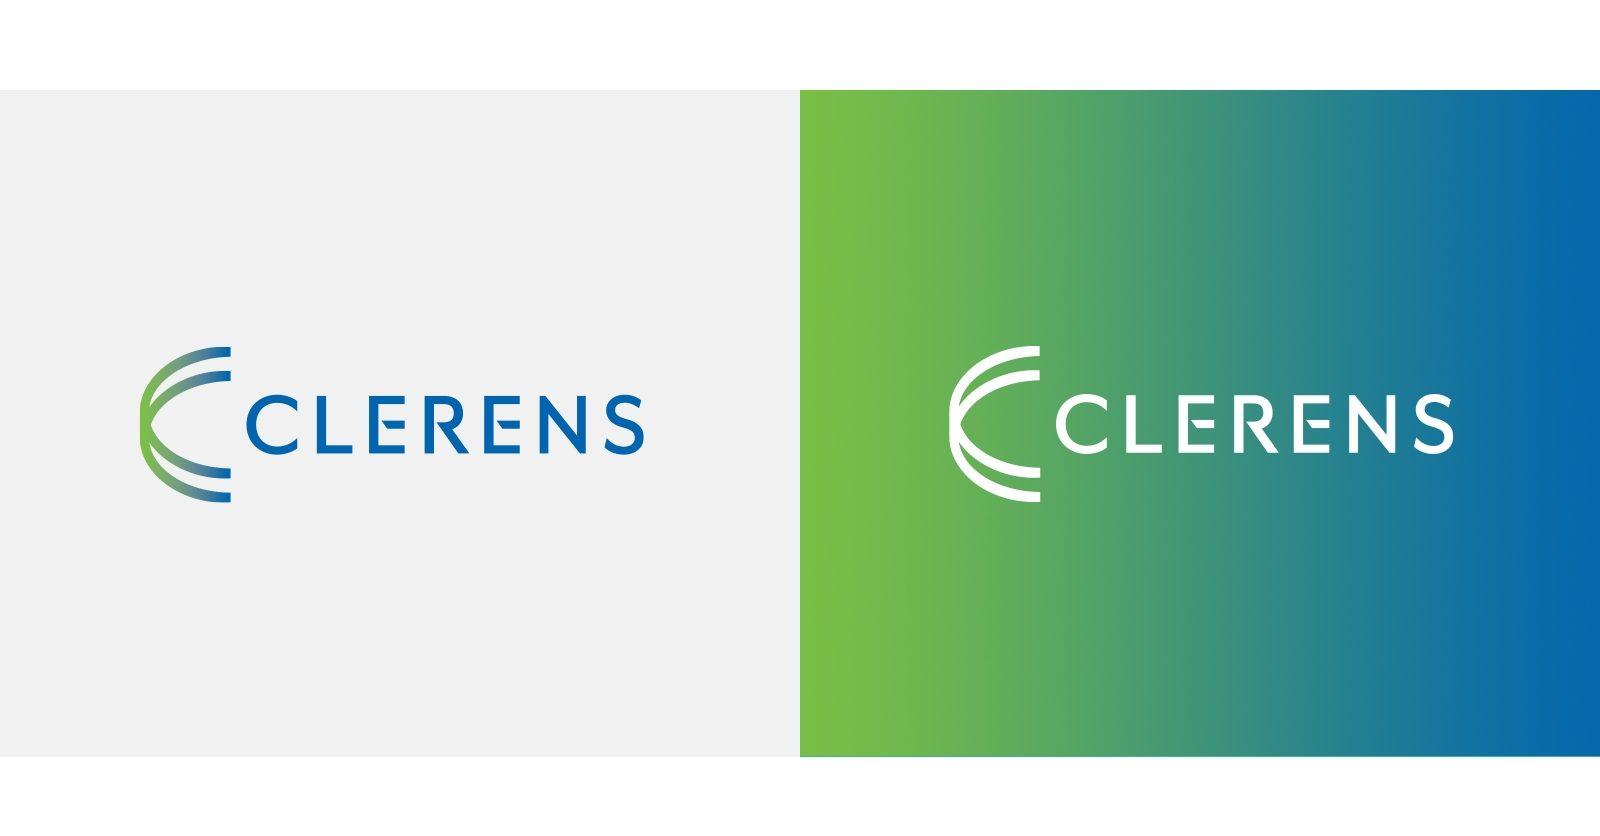 clerens logo versions